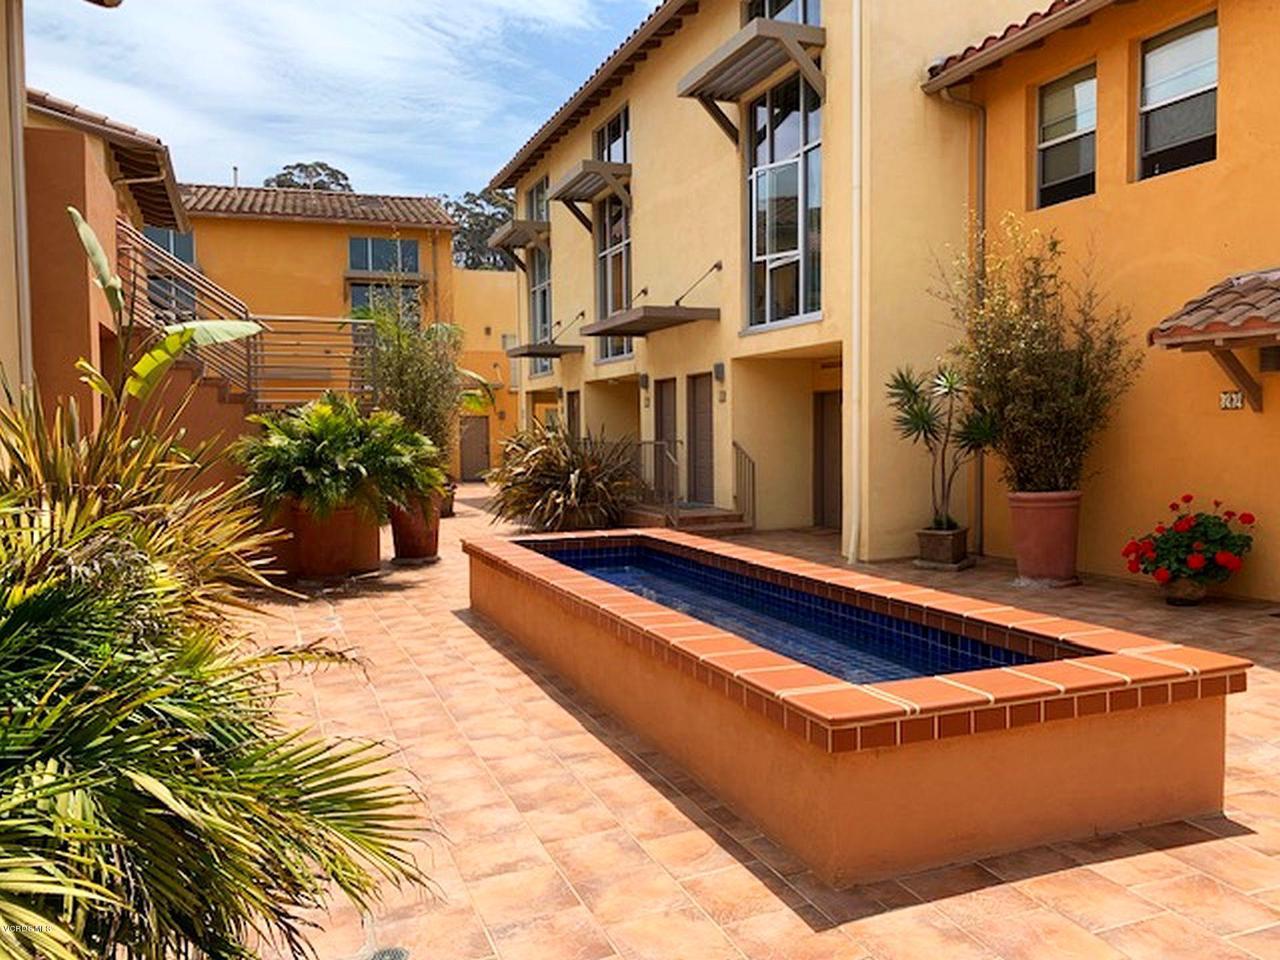 285 N Ventura Ave, Ventura, California